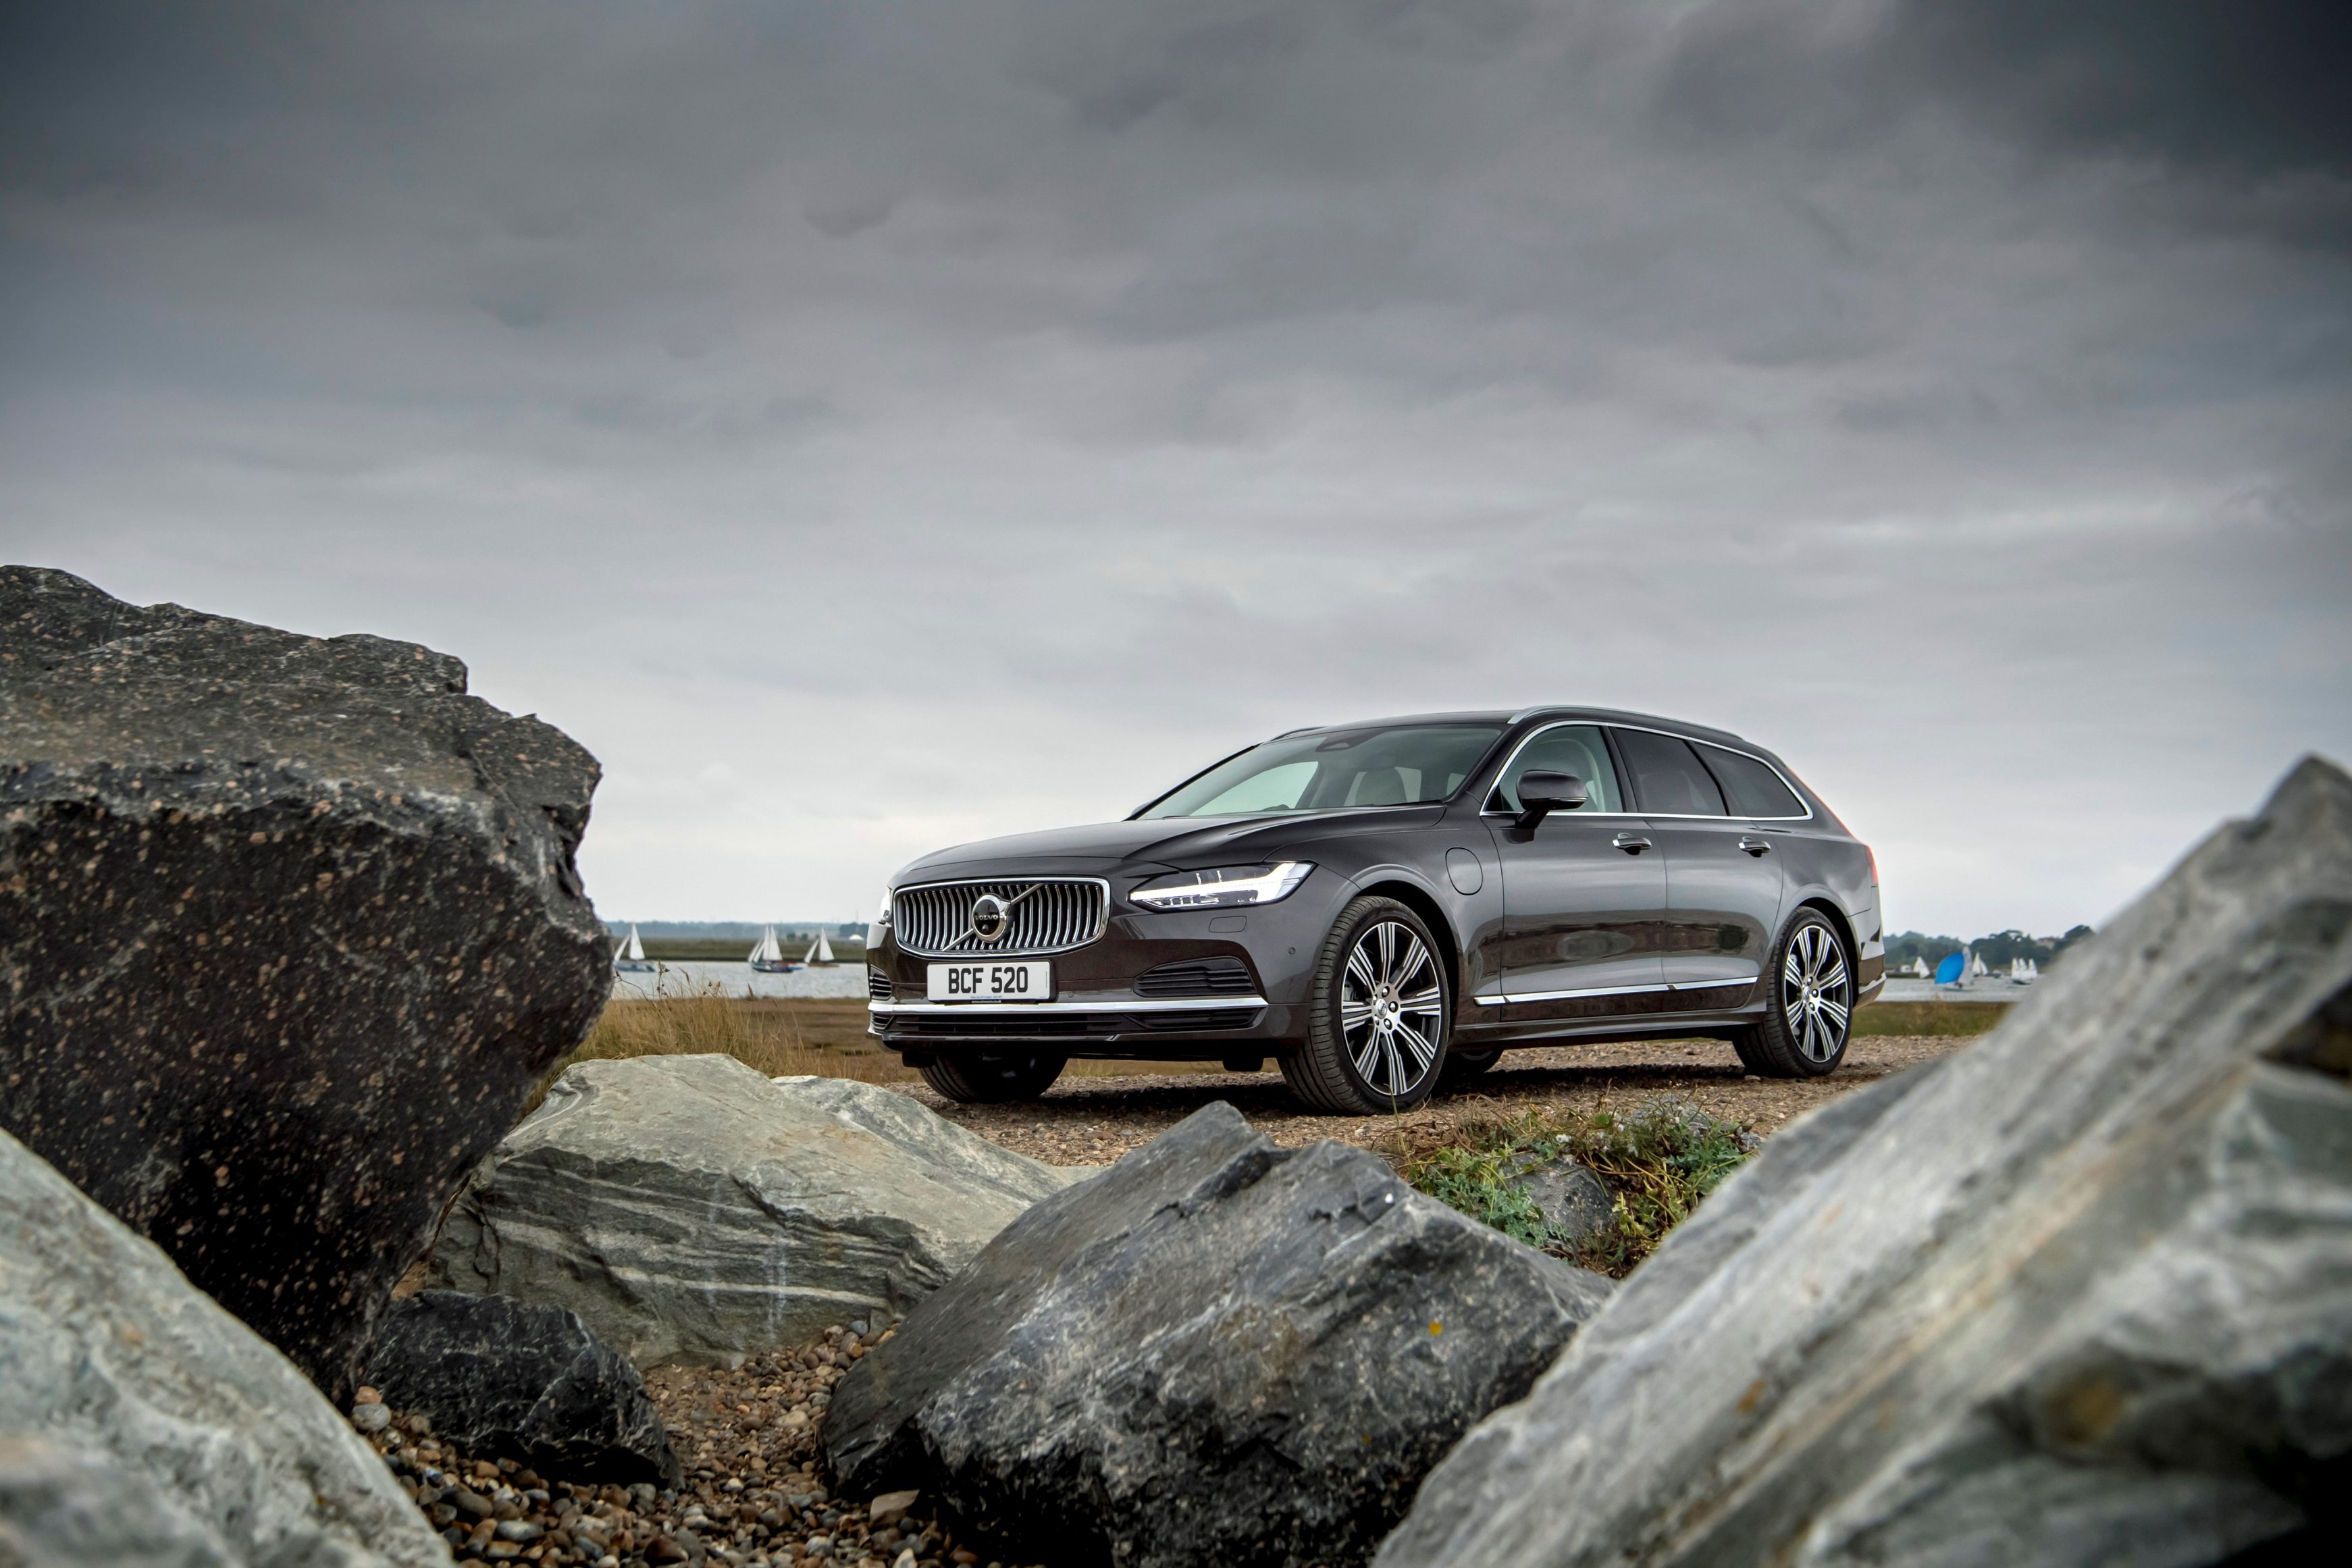 Best estate cars for towing - Volvo V90